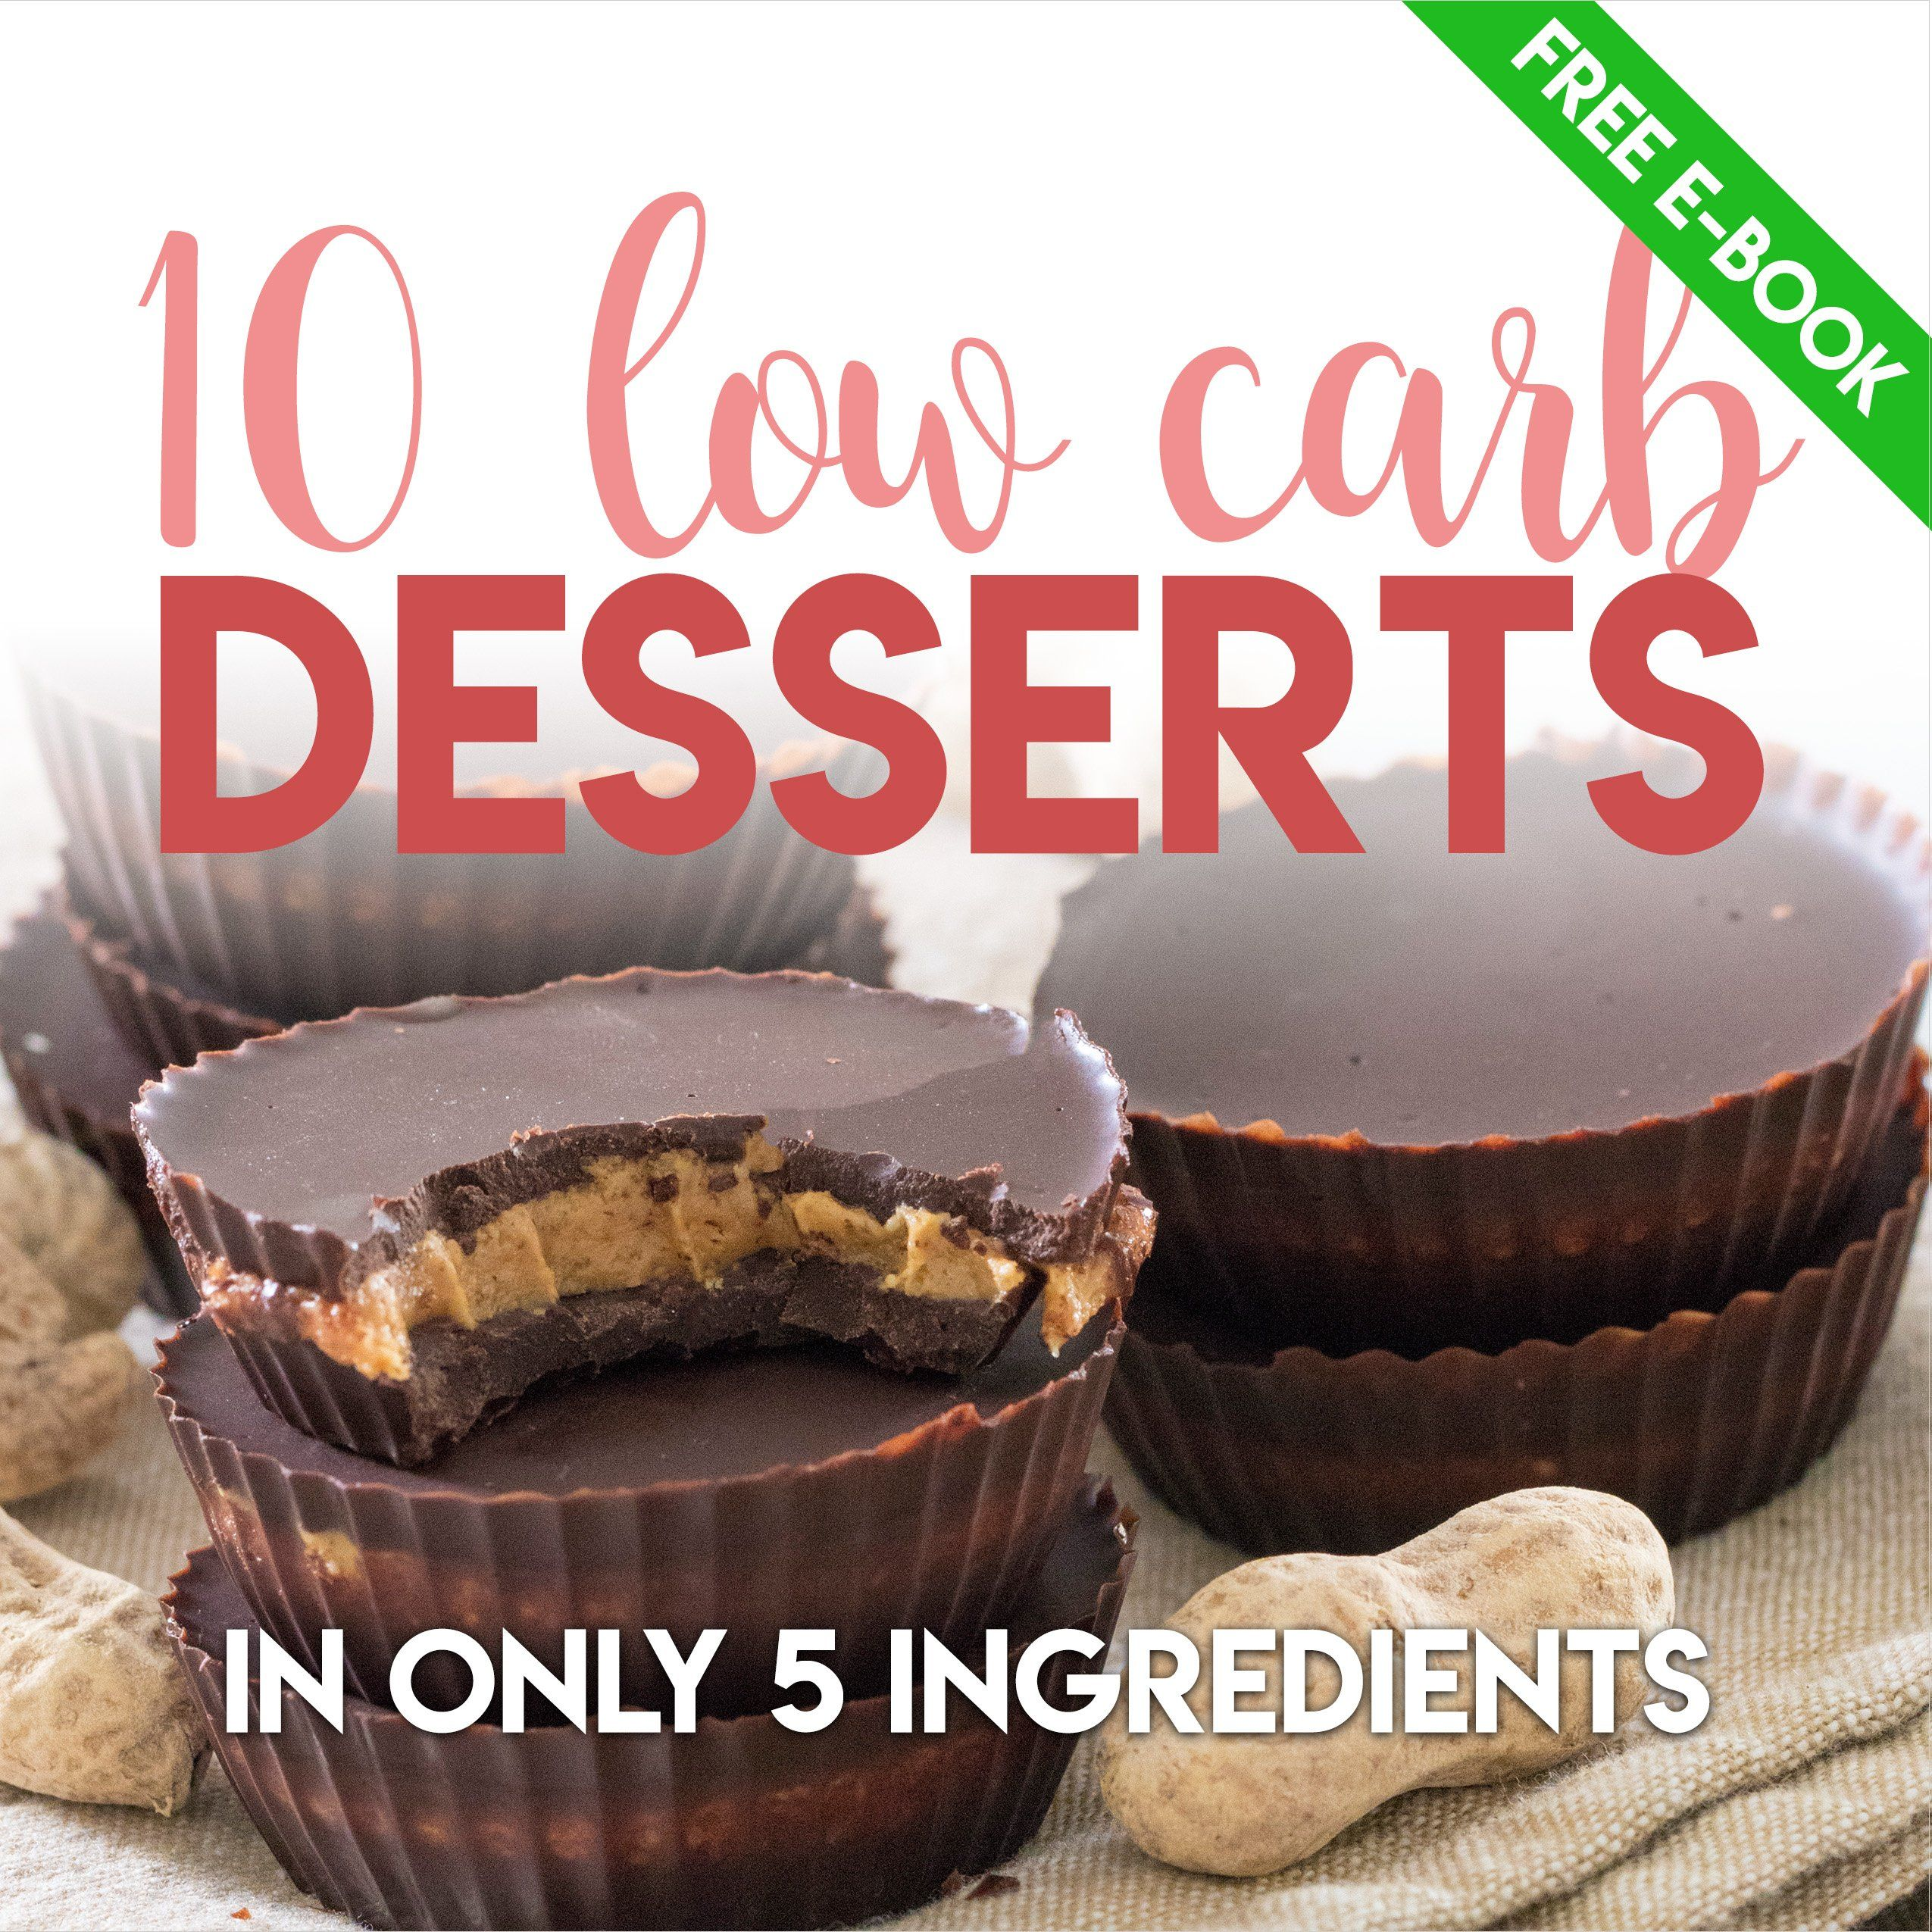 Powdered Erythritol Sweetener 1 Lb 16 Oz Free 10 Keto Desserts Pdf Confectioners No Ca Sugar Free Low Carb Desserts Low Carb Recipes Dessert Desserts